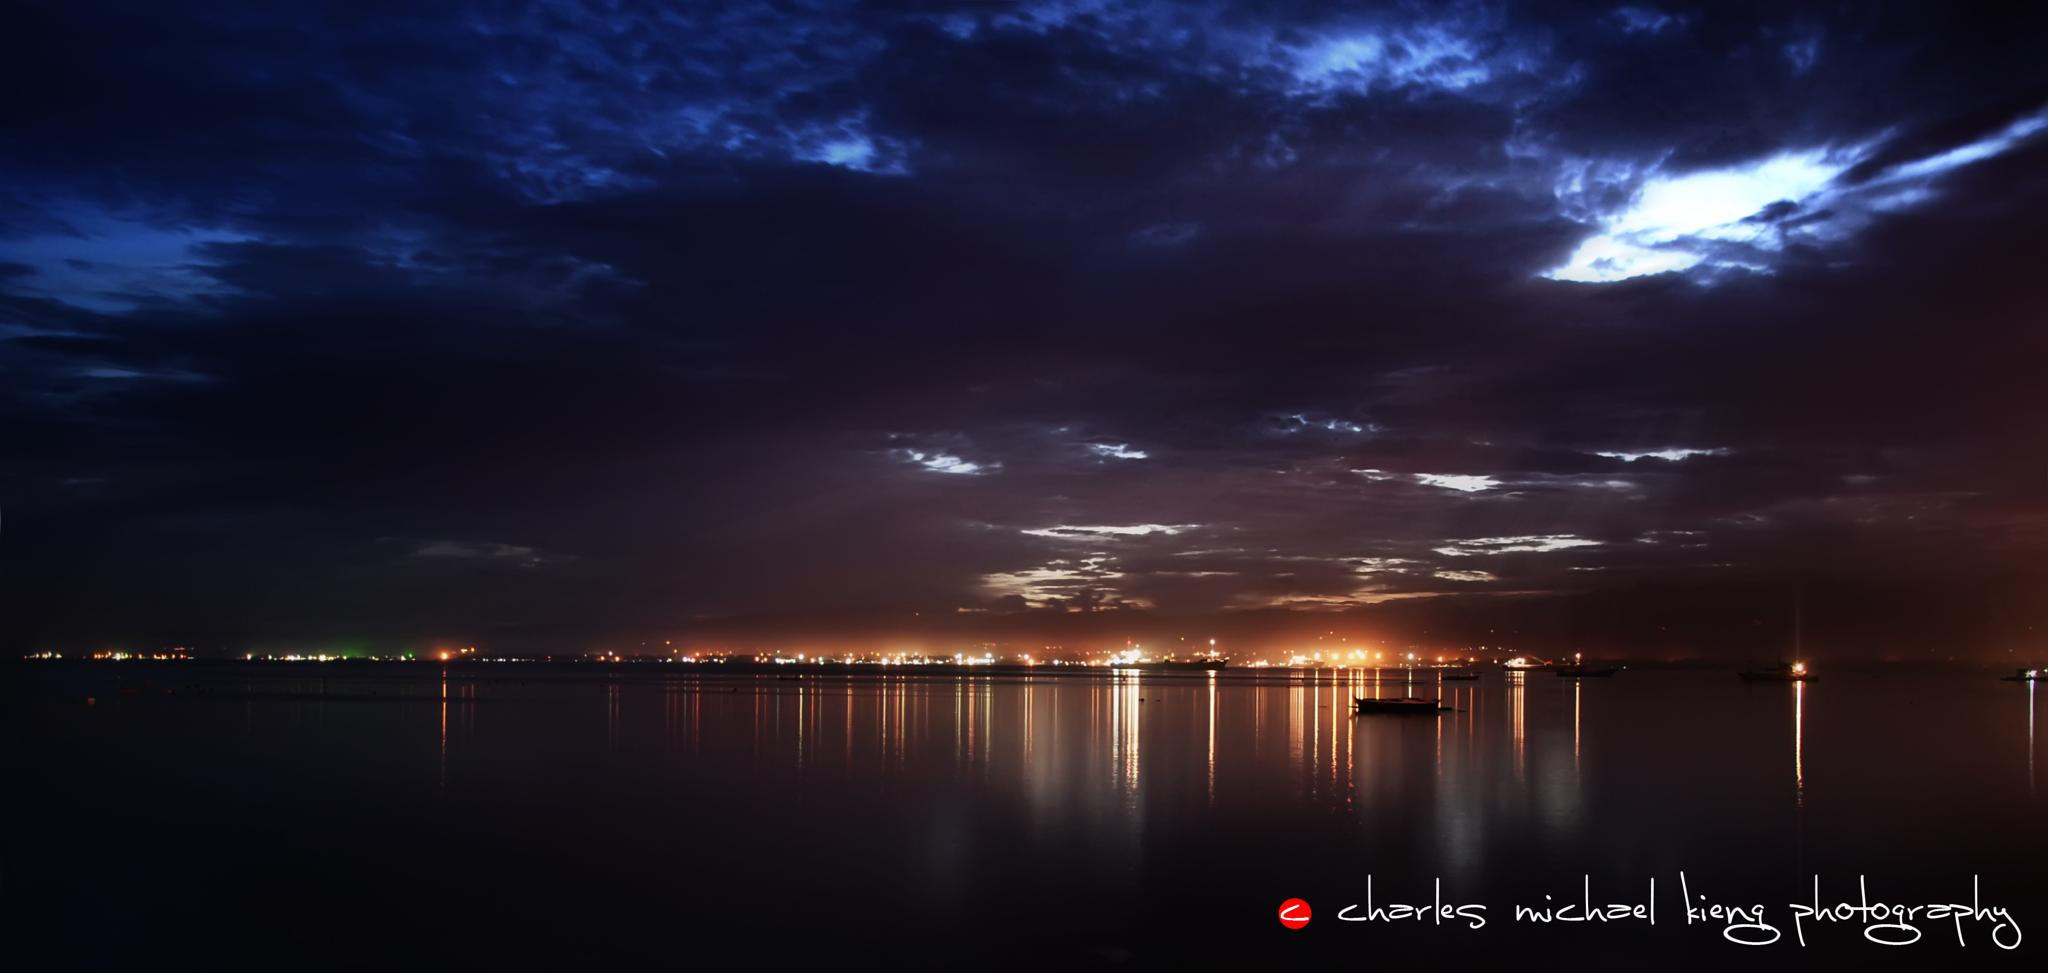 lights by Charleskieng